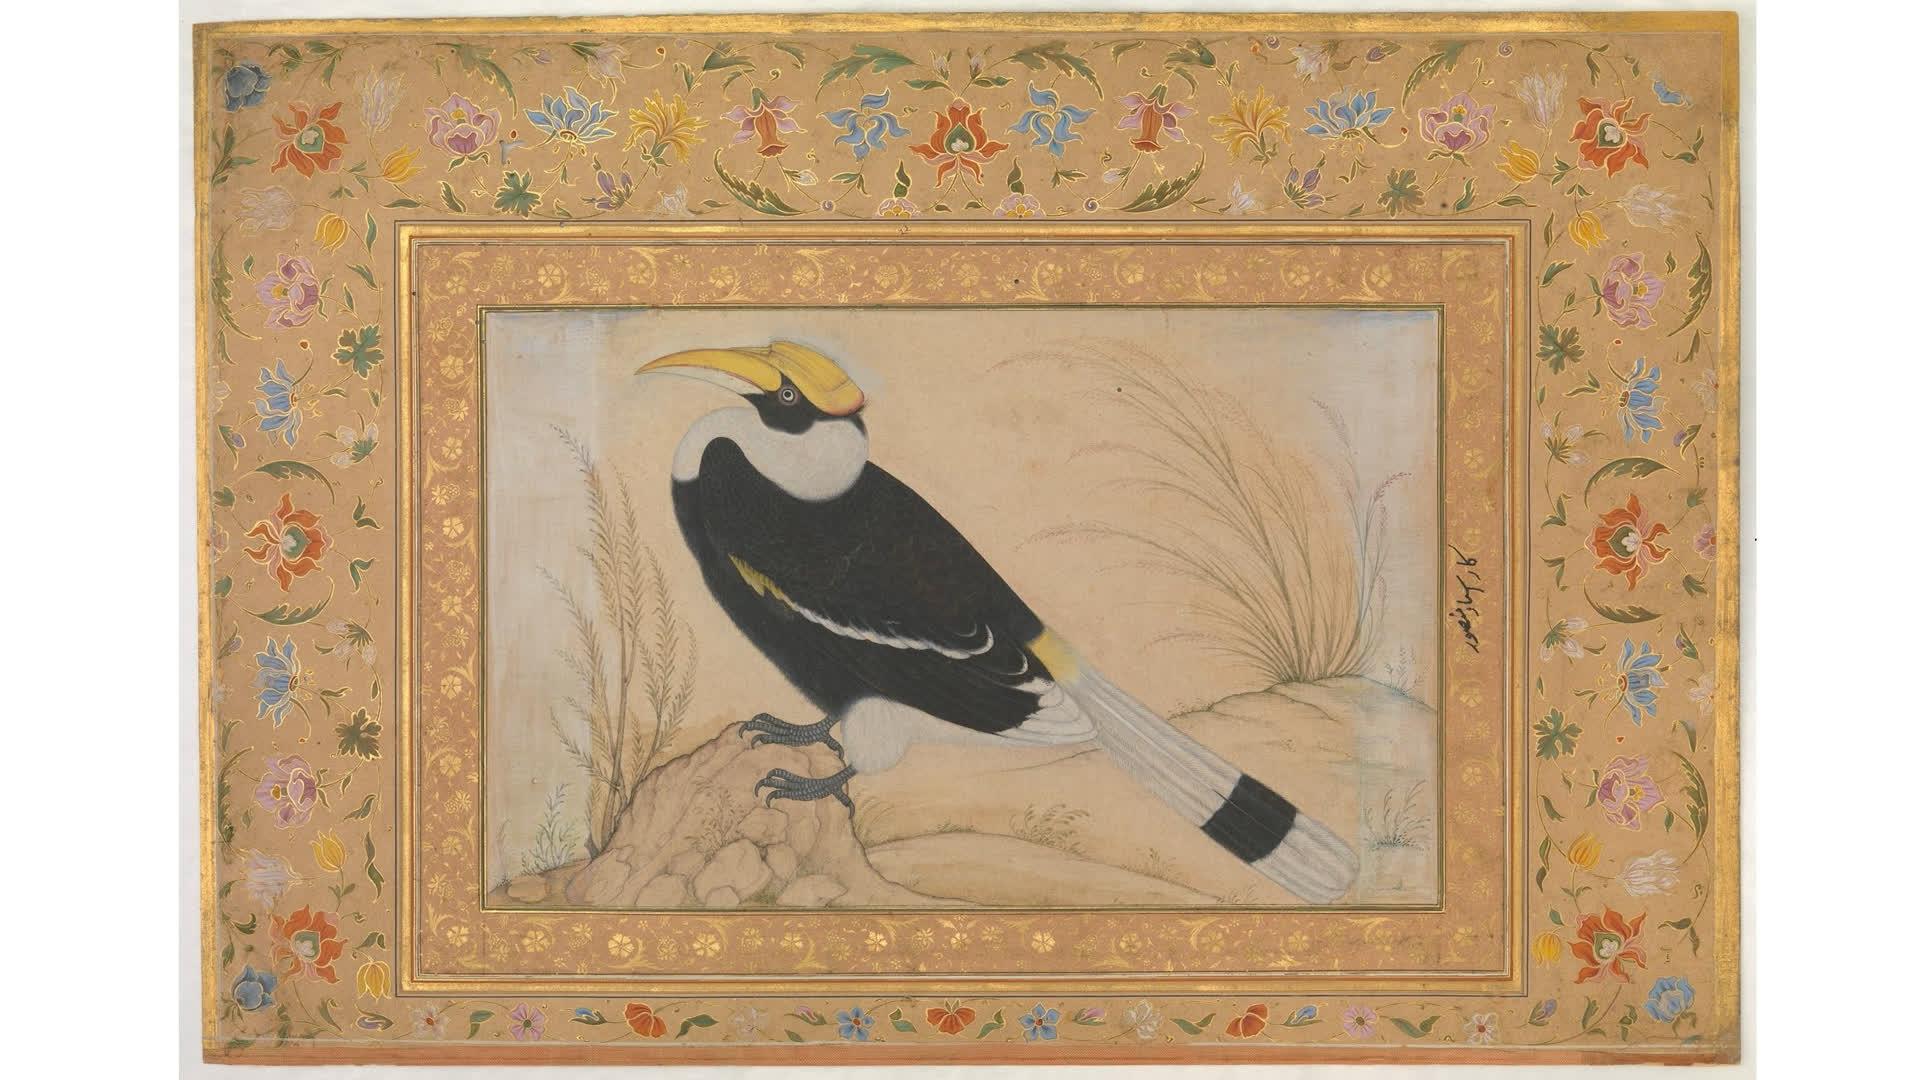 Ustad Mansur – A Wonder Of His Age